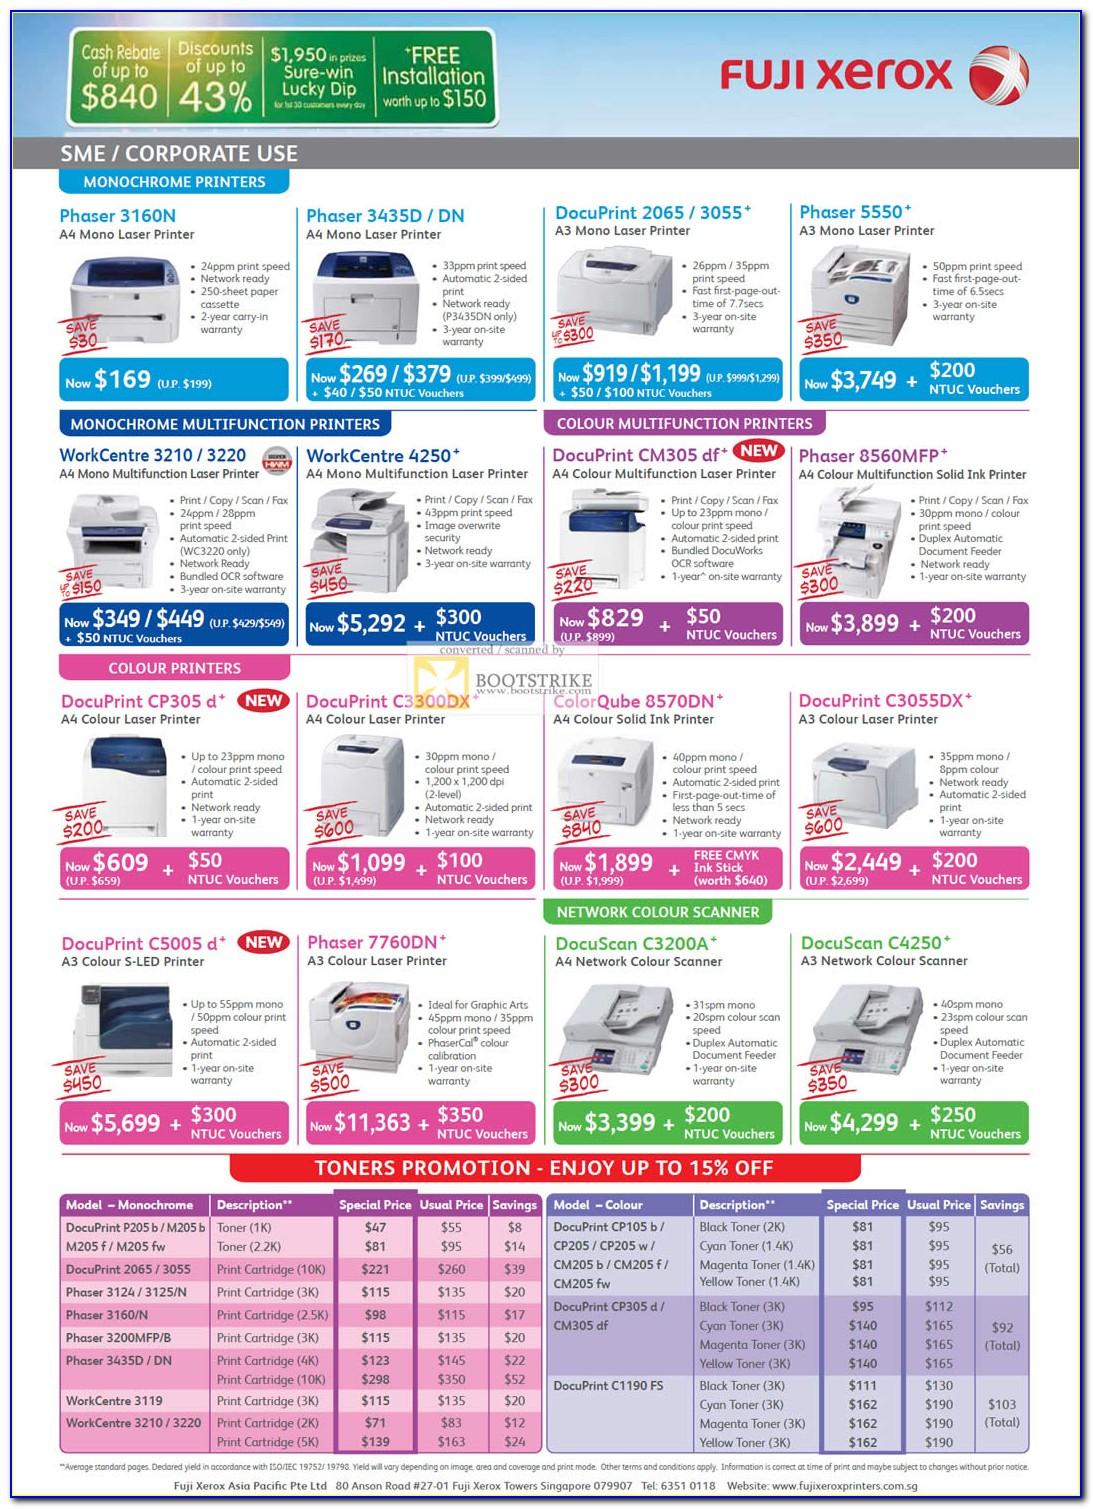 Fuji Xerox Workcentre 4250 Brochure